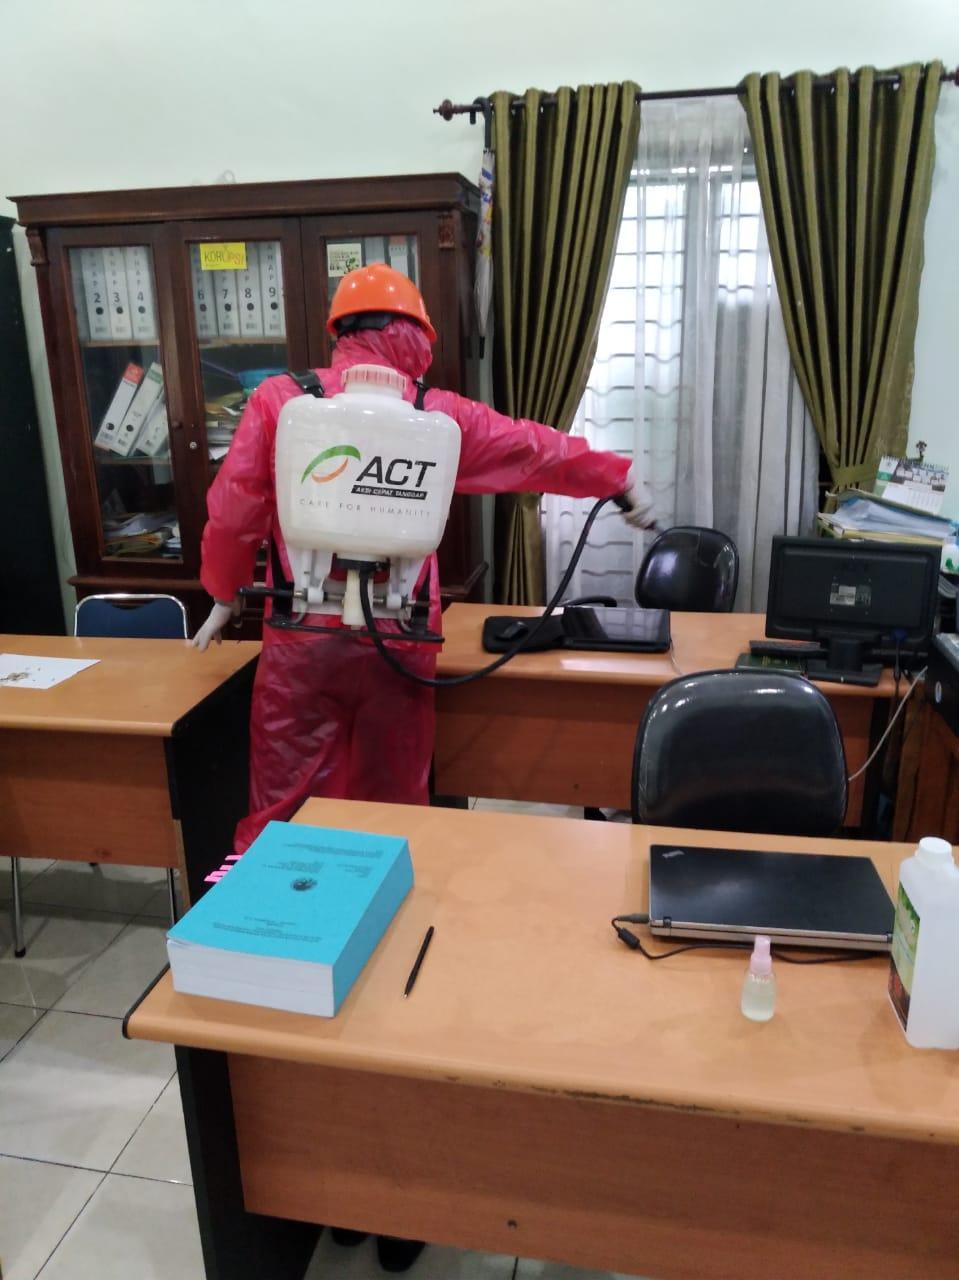 Ket poto : Relawan MRI Sumut sedang menyemprotkan desinpektan di salahsatu perkantoran di Medan. (ist)